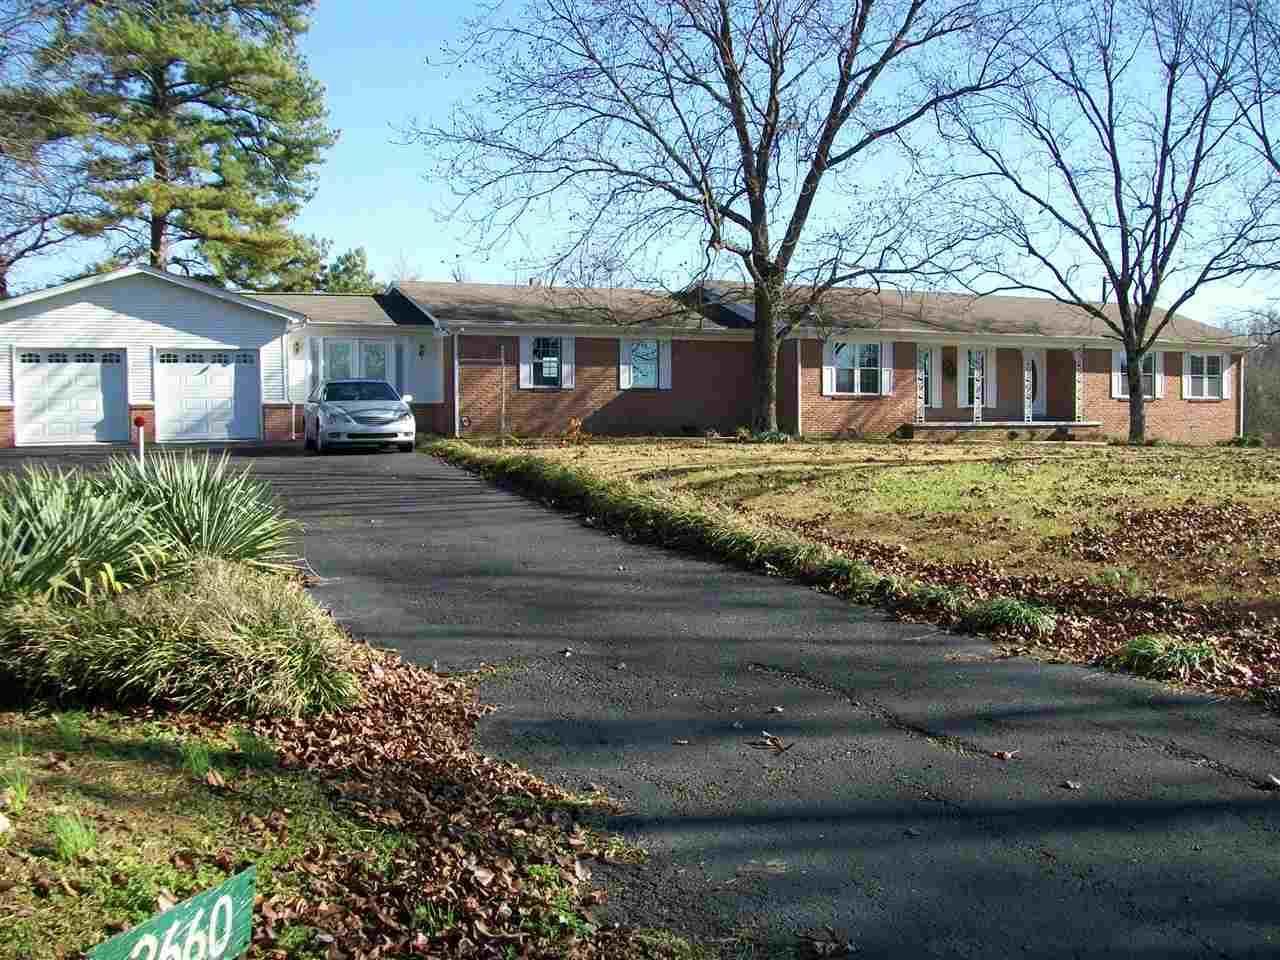 2660 Powell Chapel Rd - Photo 1